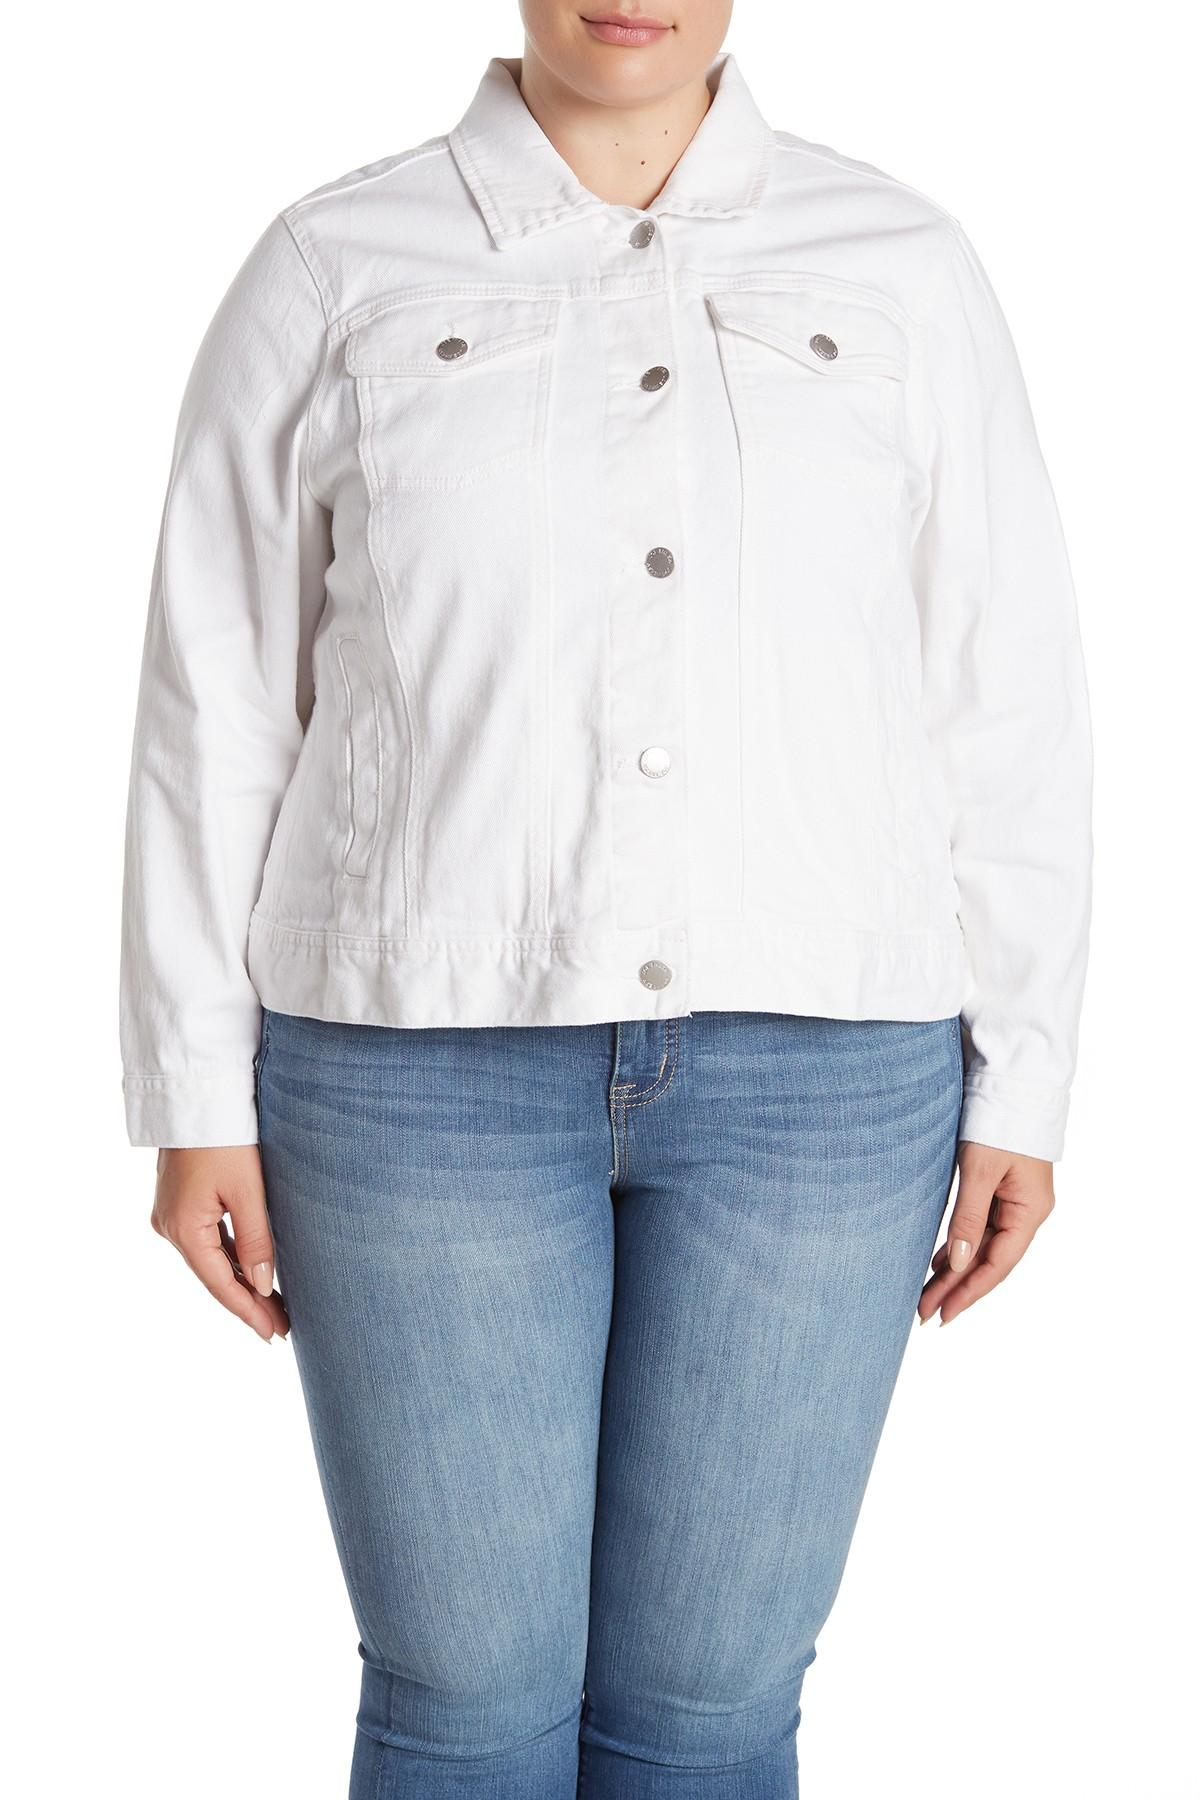 796f9e740 Joe Fresh White Denim Jacket (plus Size) in White - Lyst